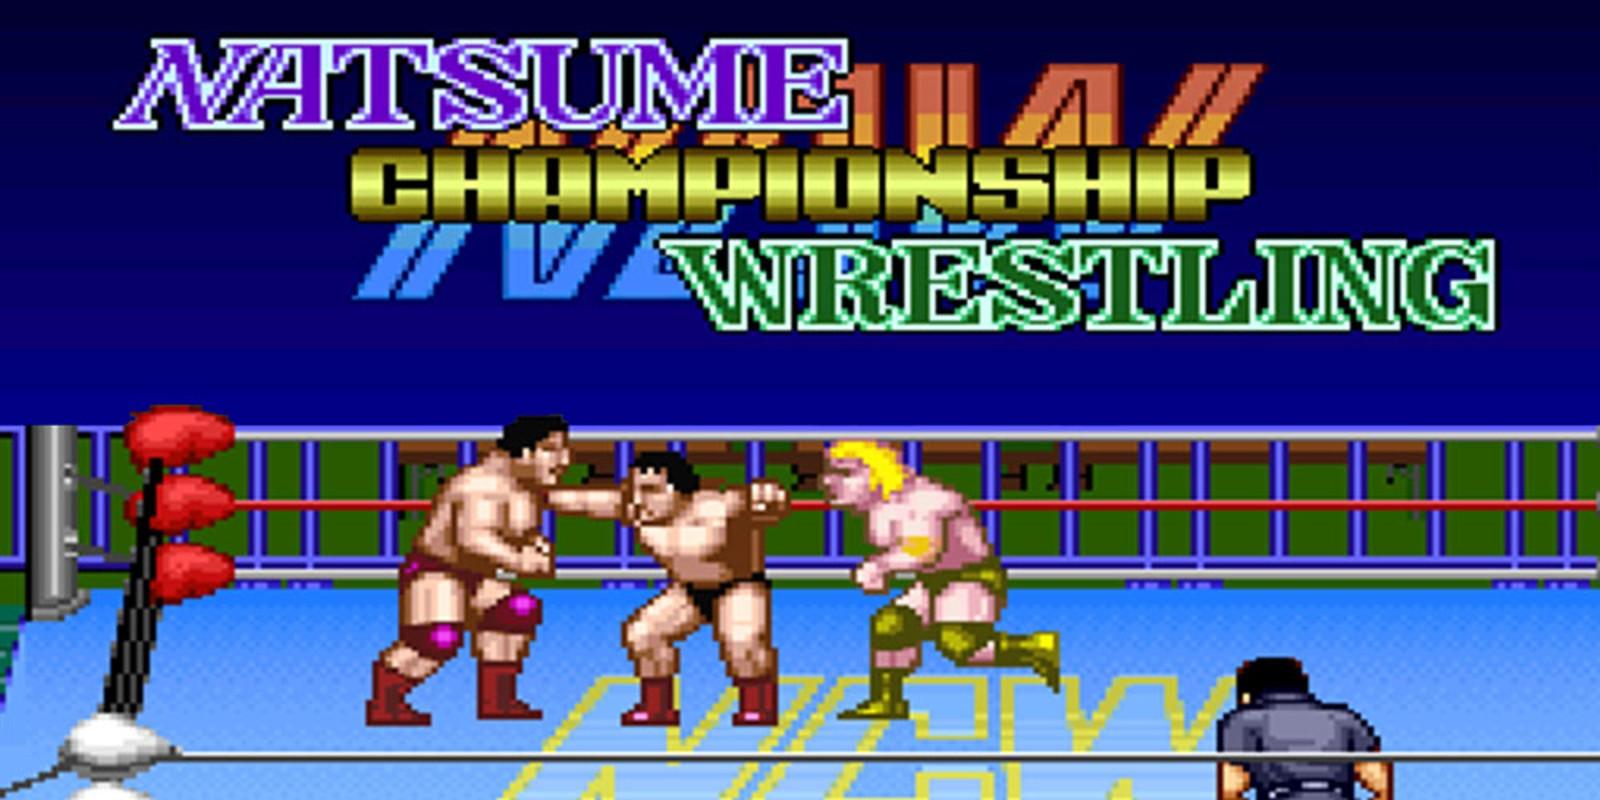 Natsume Championship Wrestling™ | Super Nintendo | Juegos | Nintendo